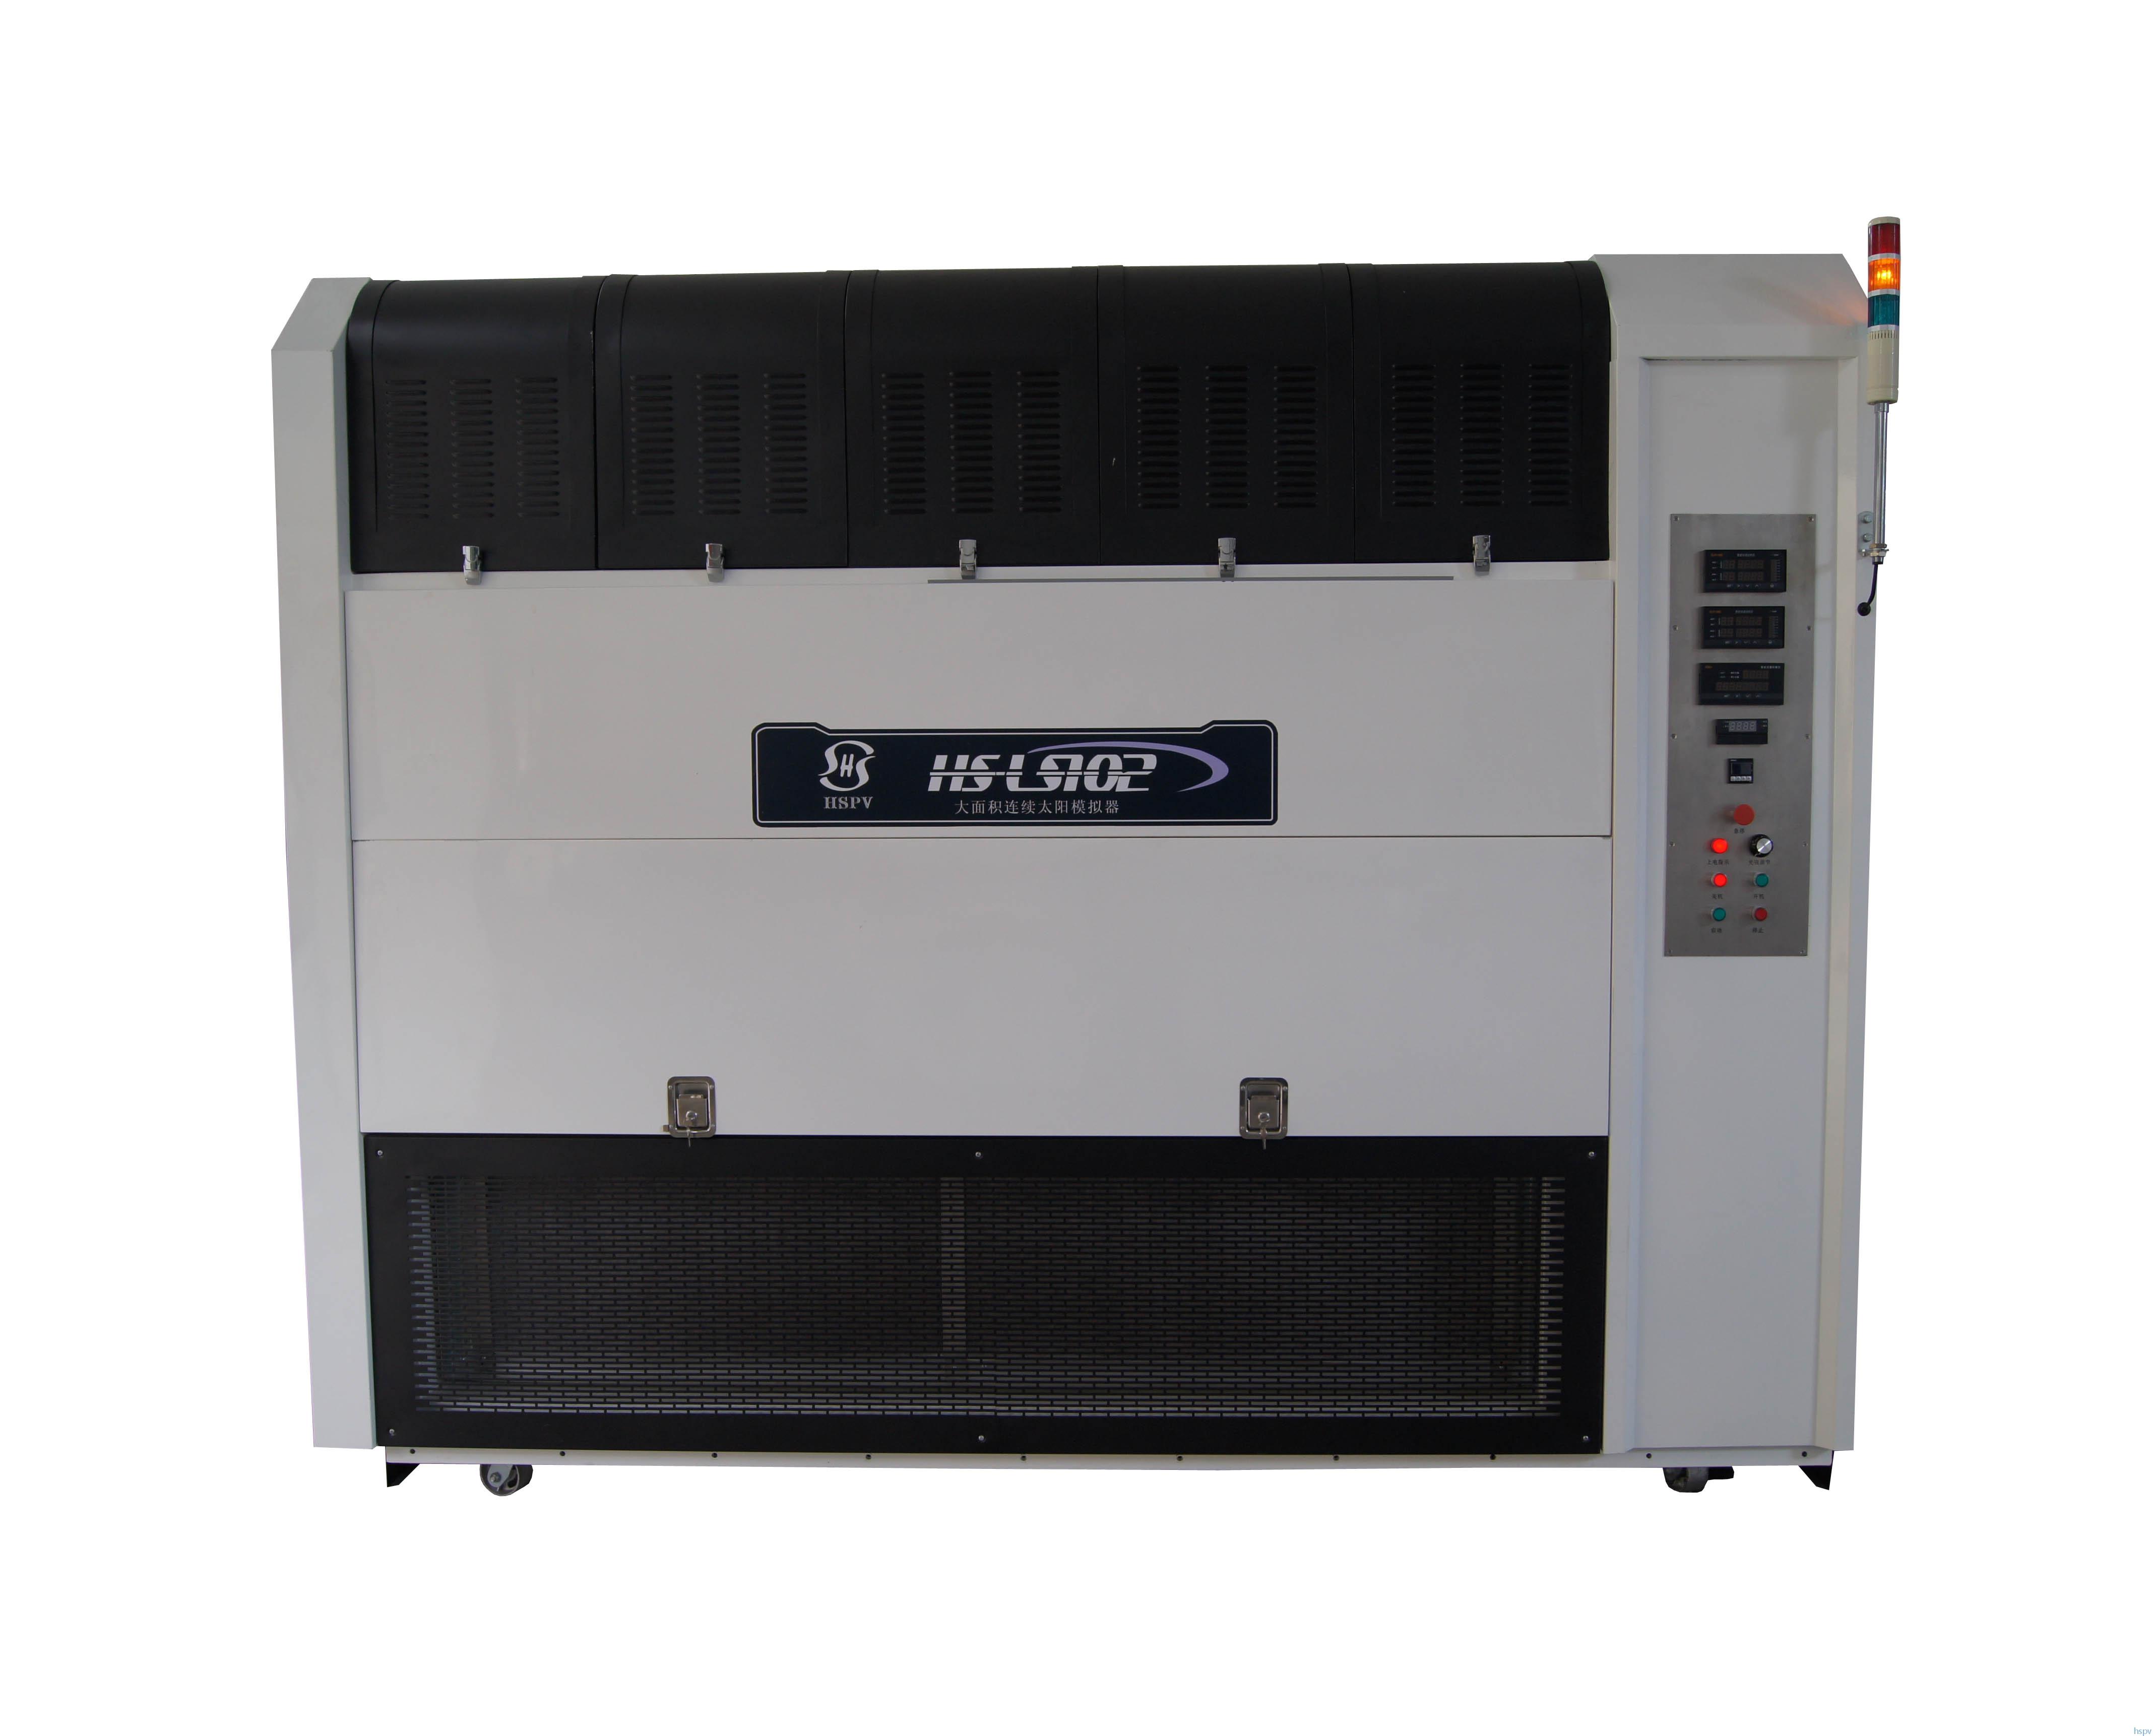 HSLS102 稳态太阳能模拟器